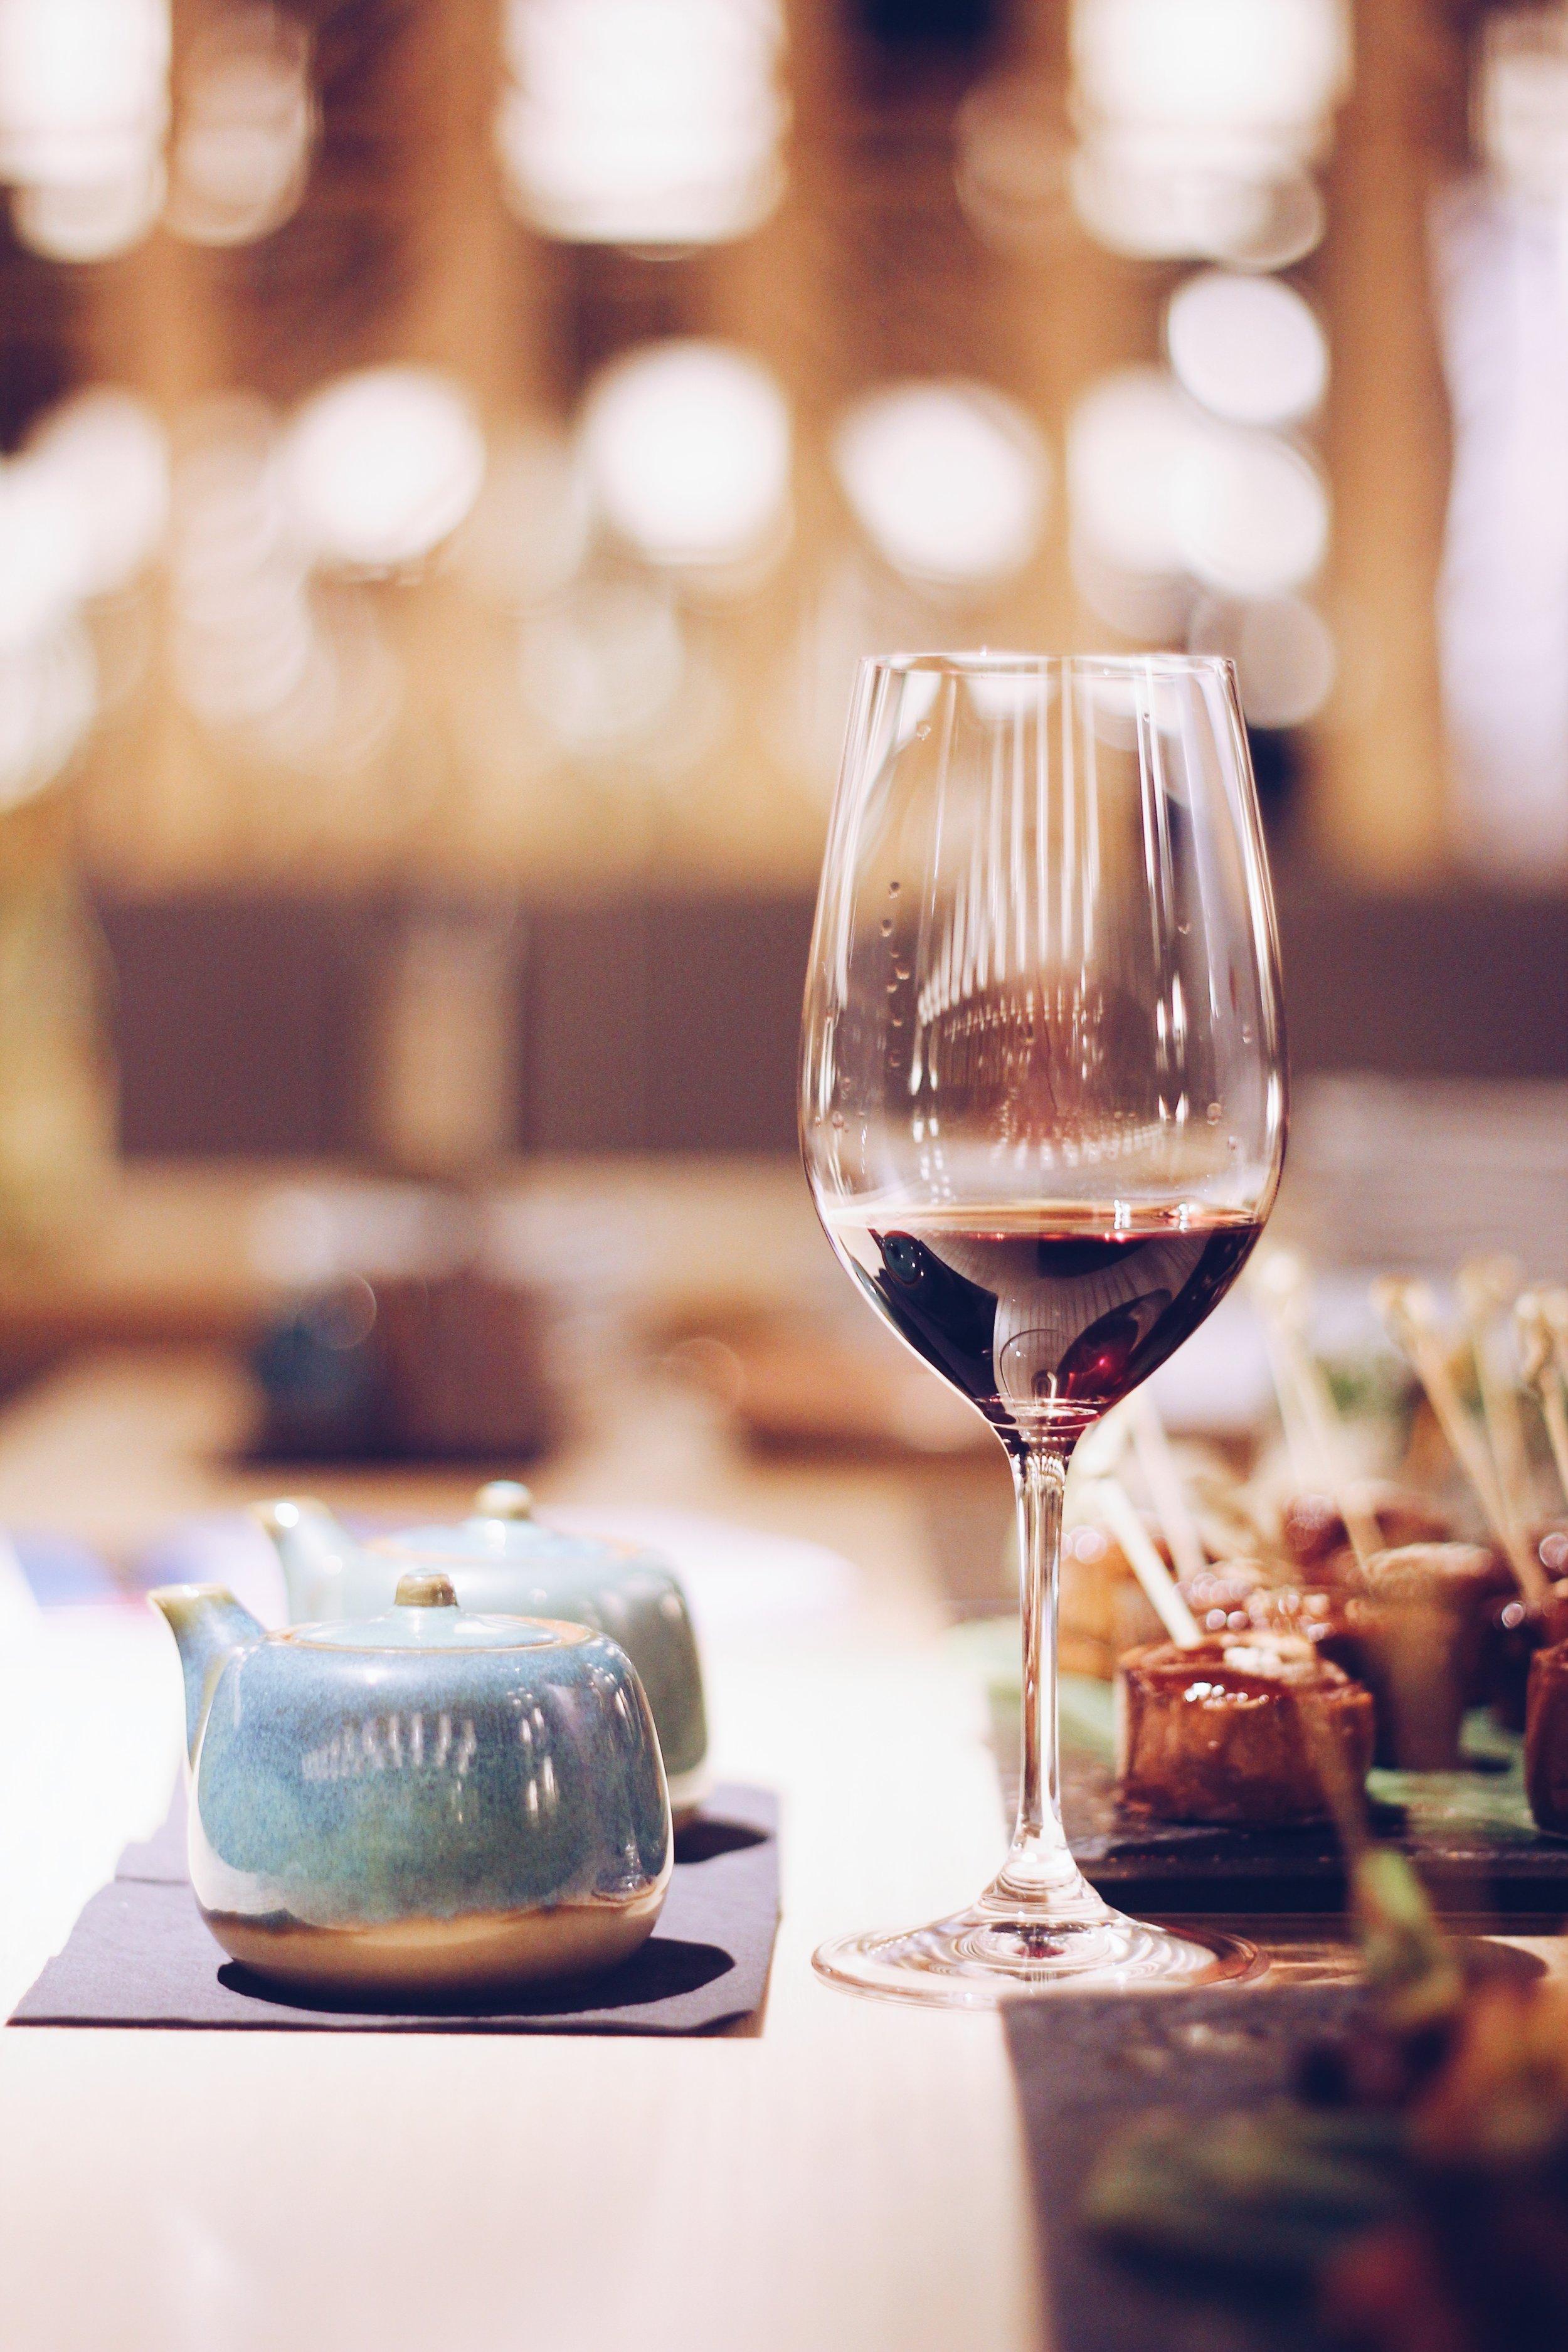 Onodera - Wines of Japan